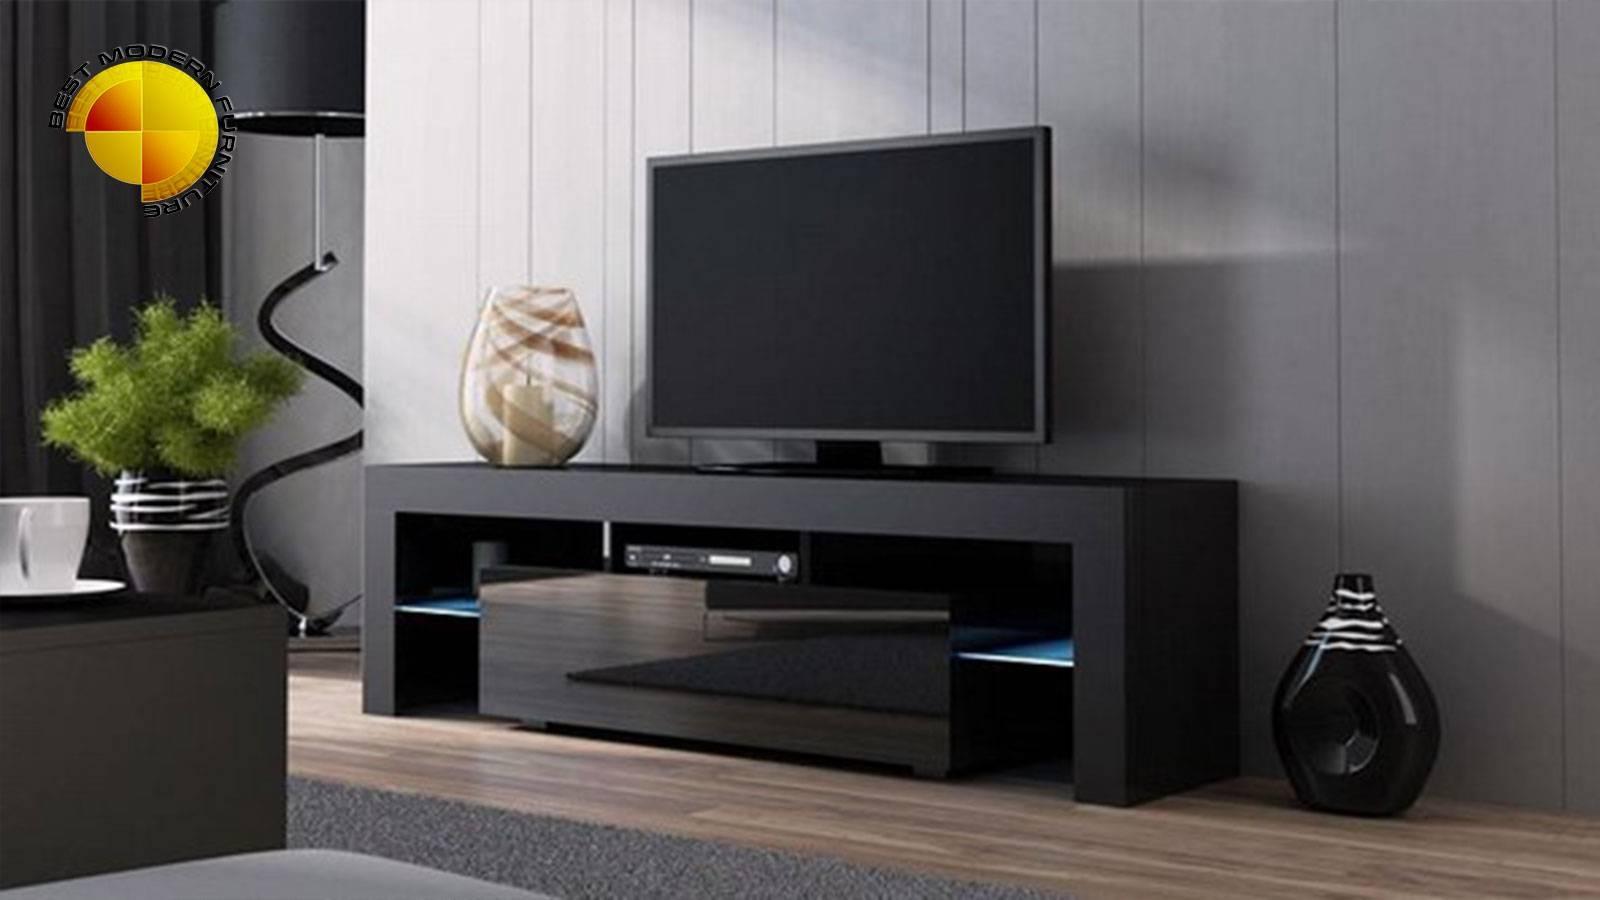 Modern Tv Stand 160cm High Gloss Cabinet Rgb Led Lights Black Unit Regarding High Gloss White Tv Stands (View 15 of 15)